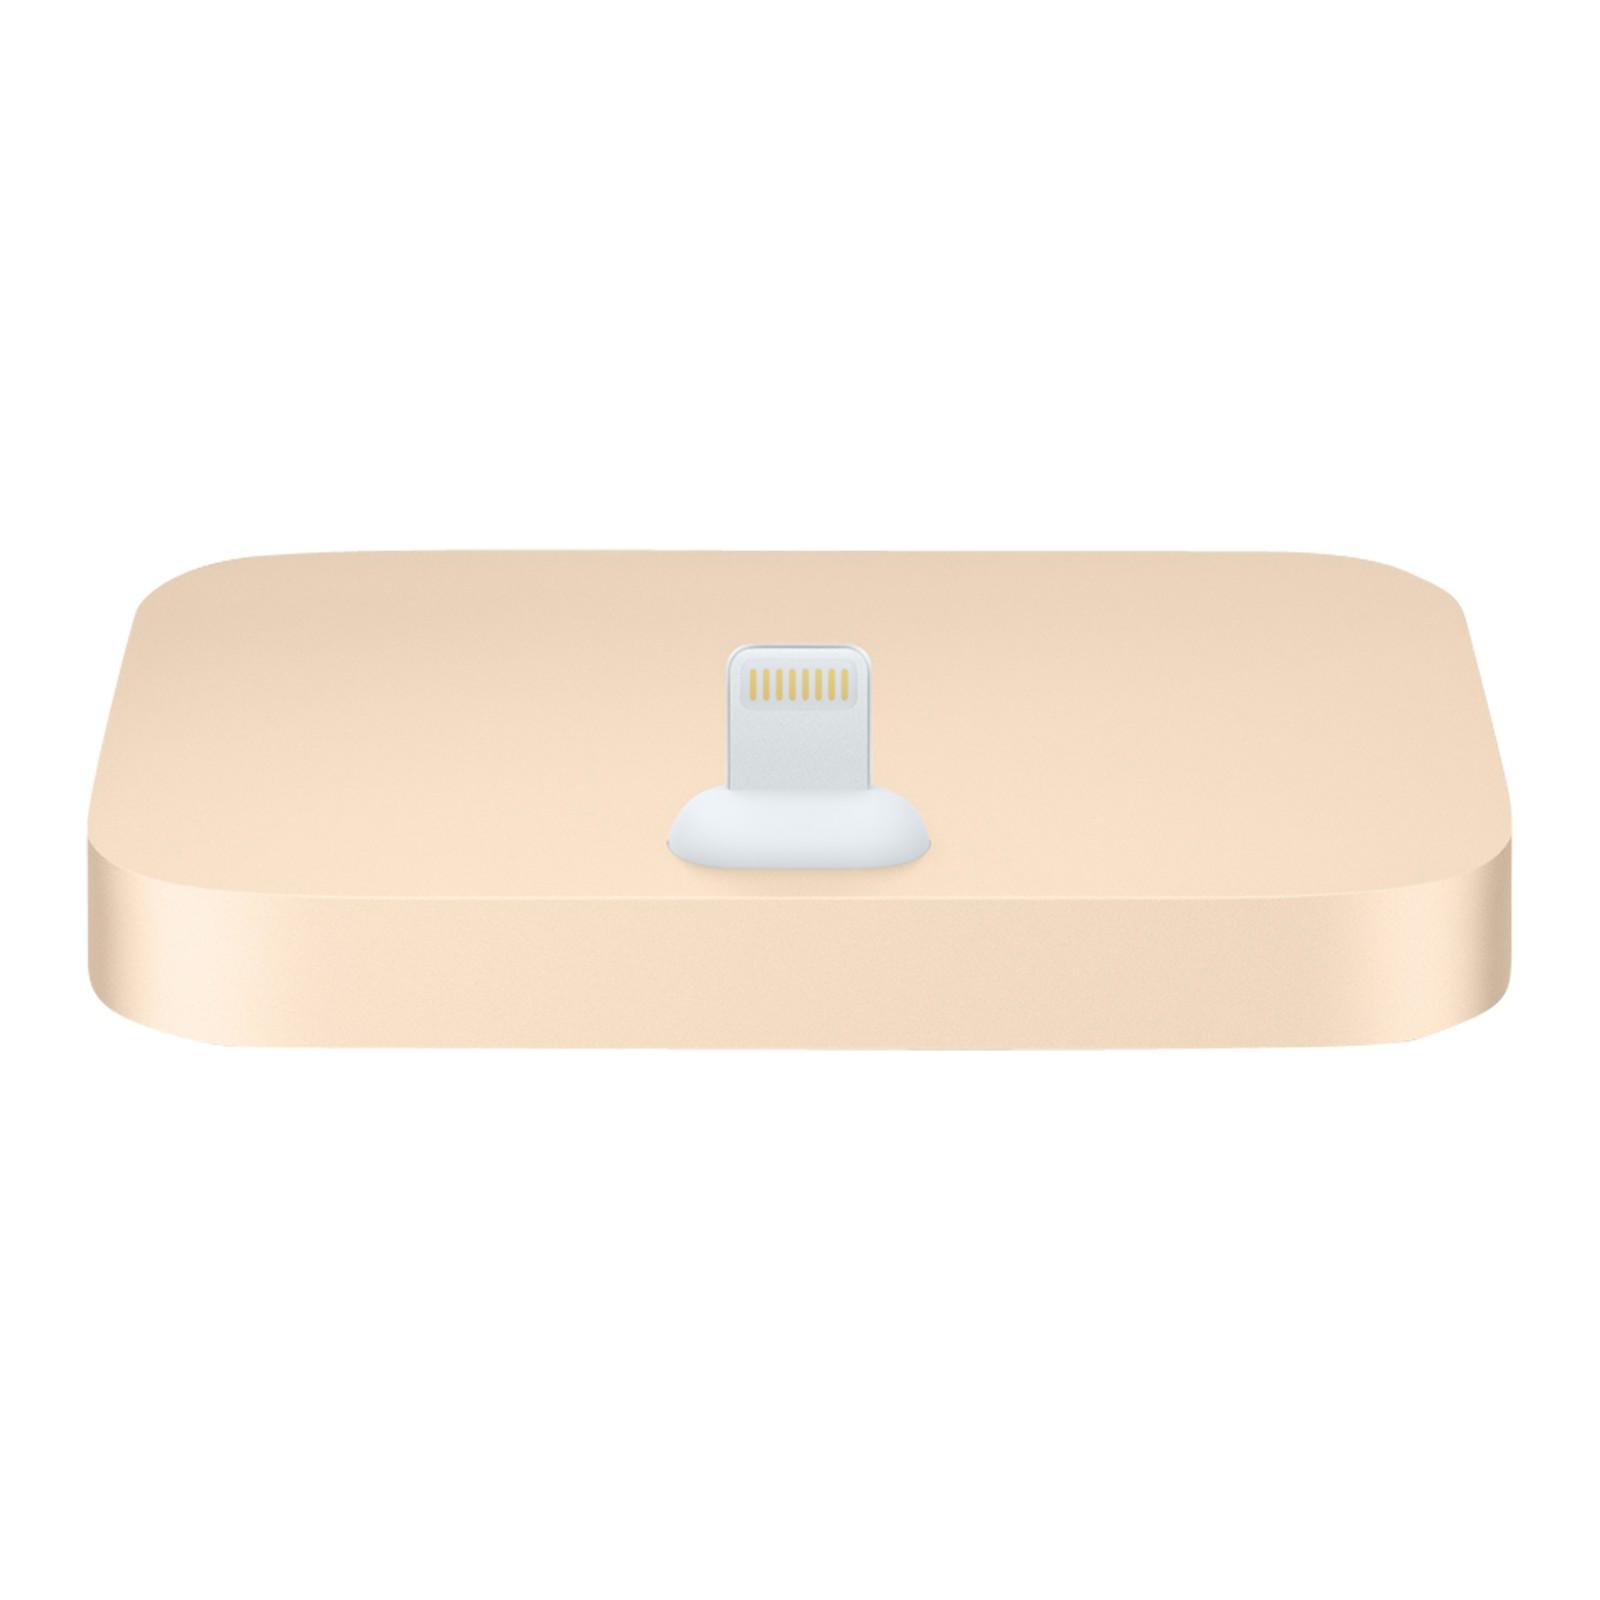 Apple Lightning Dock for iPhone Gold